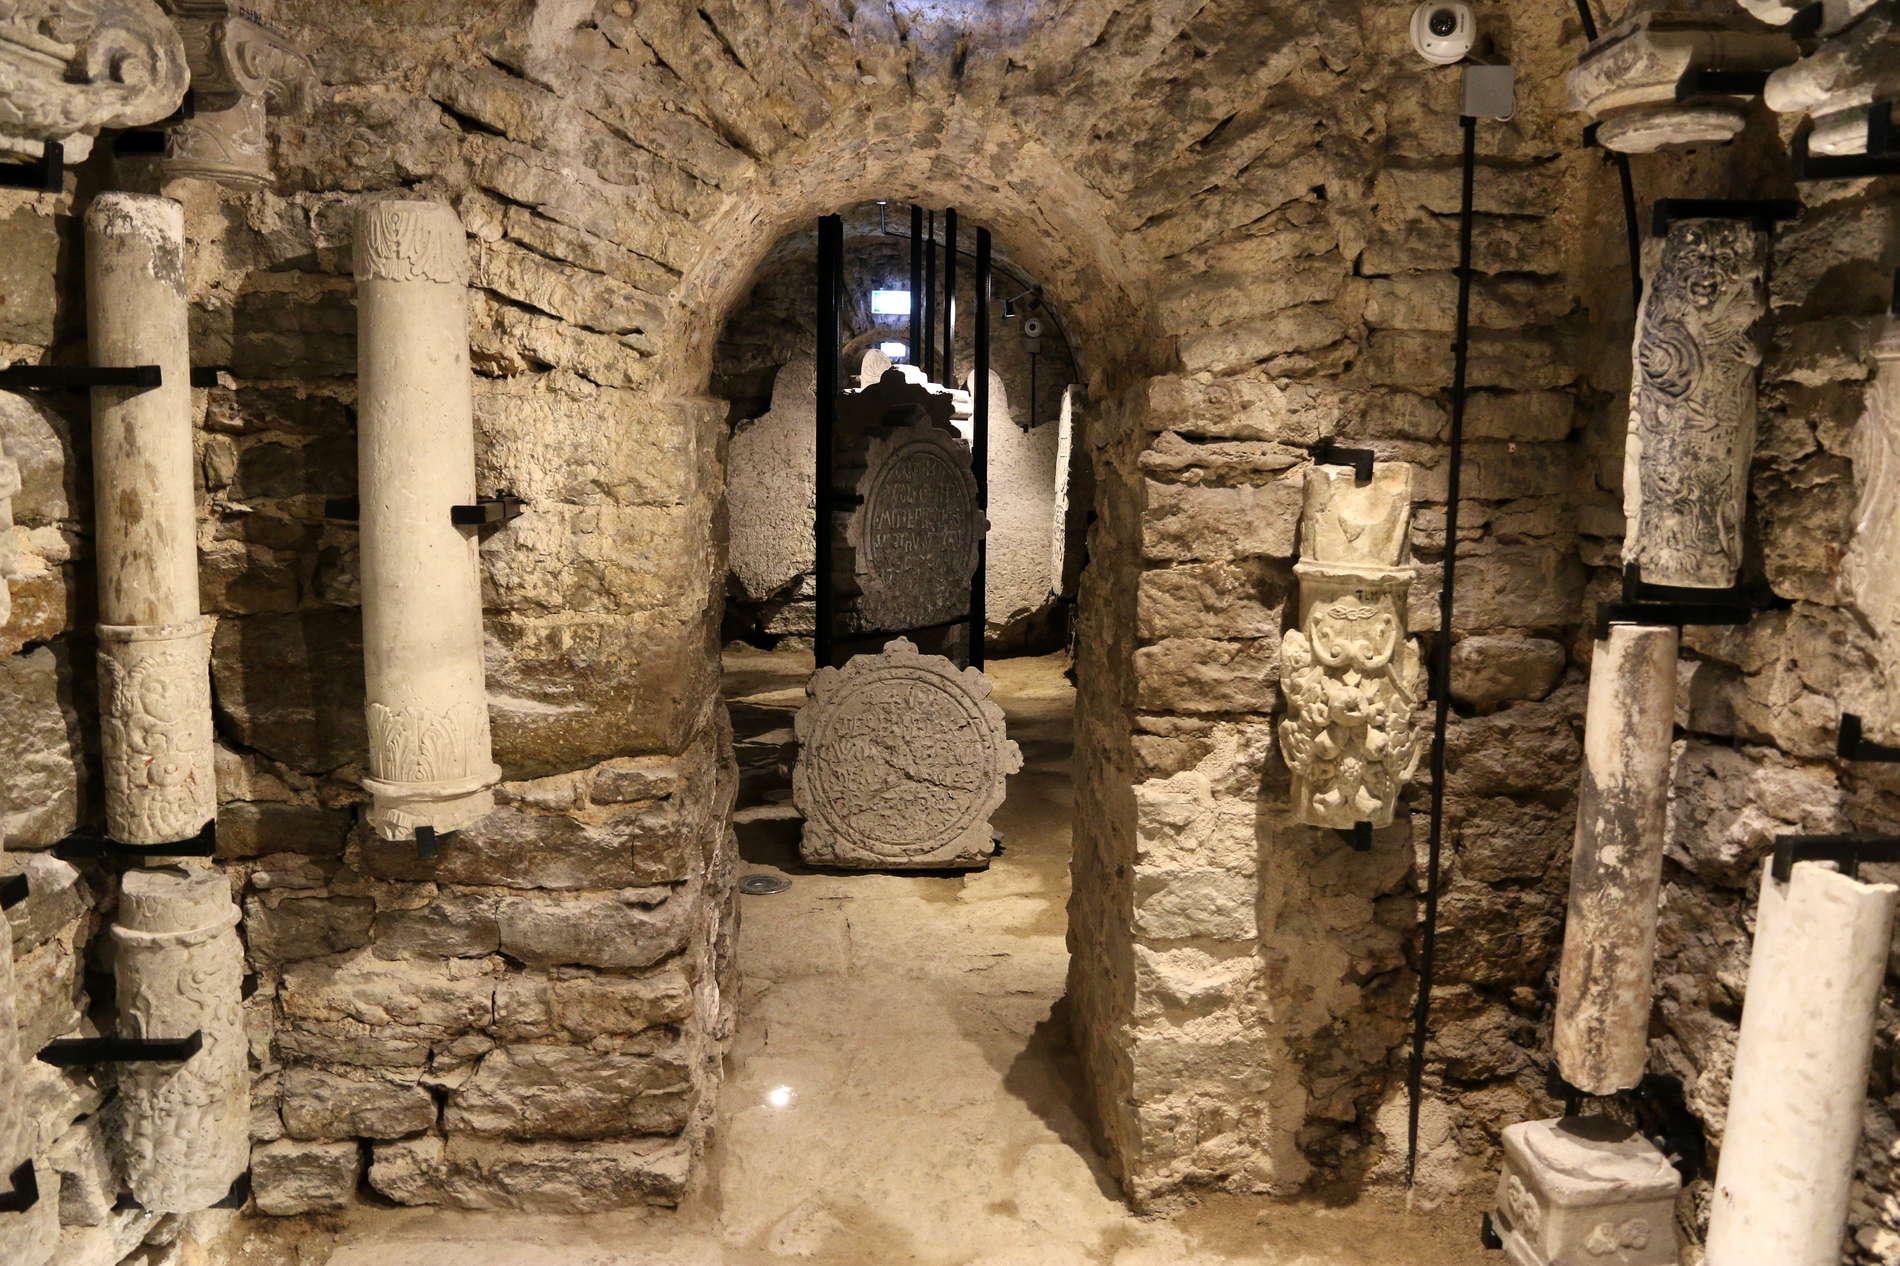 Carved Stone Museum in Tallinn, Estonia